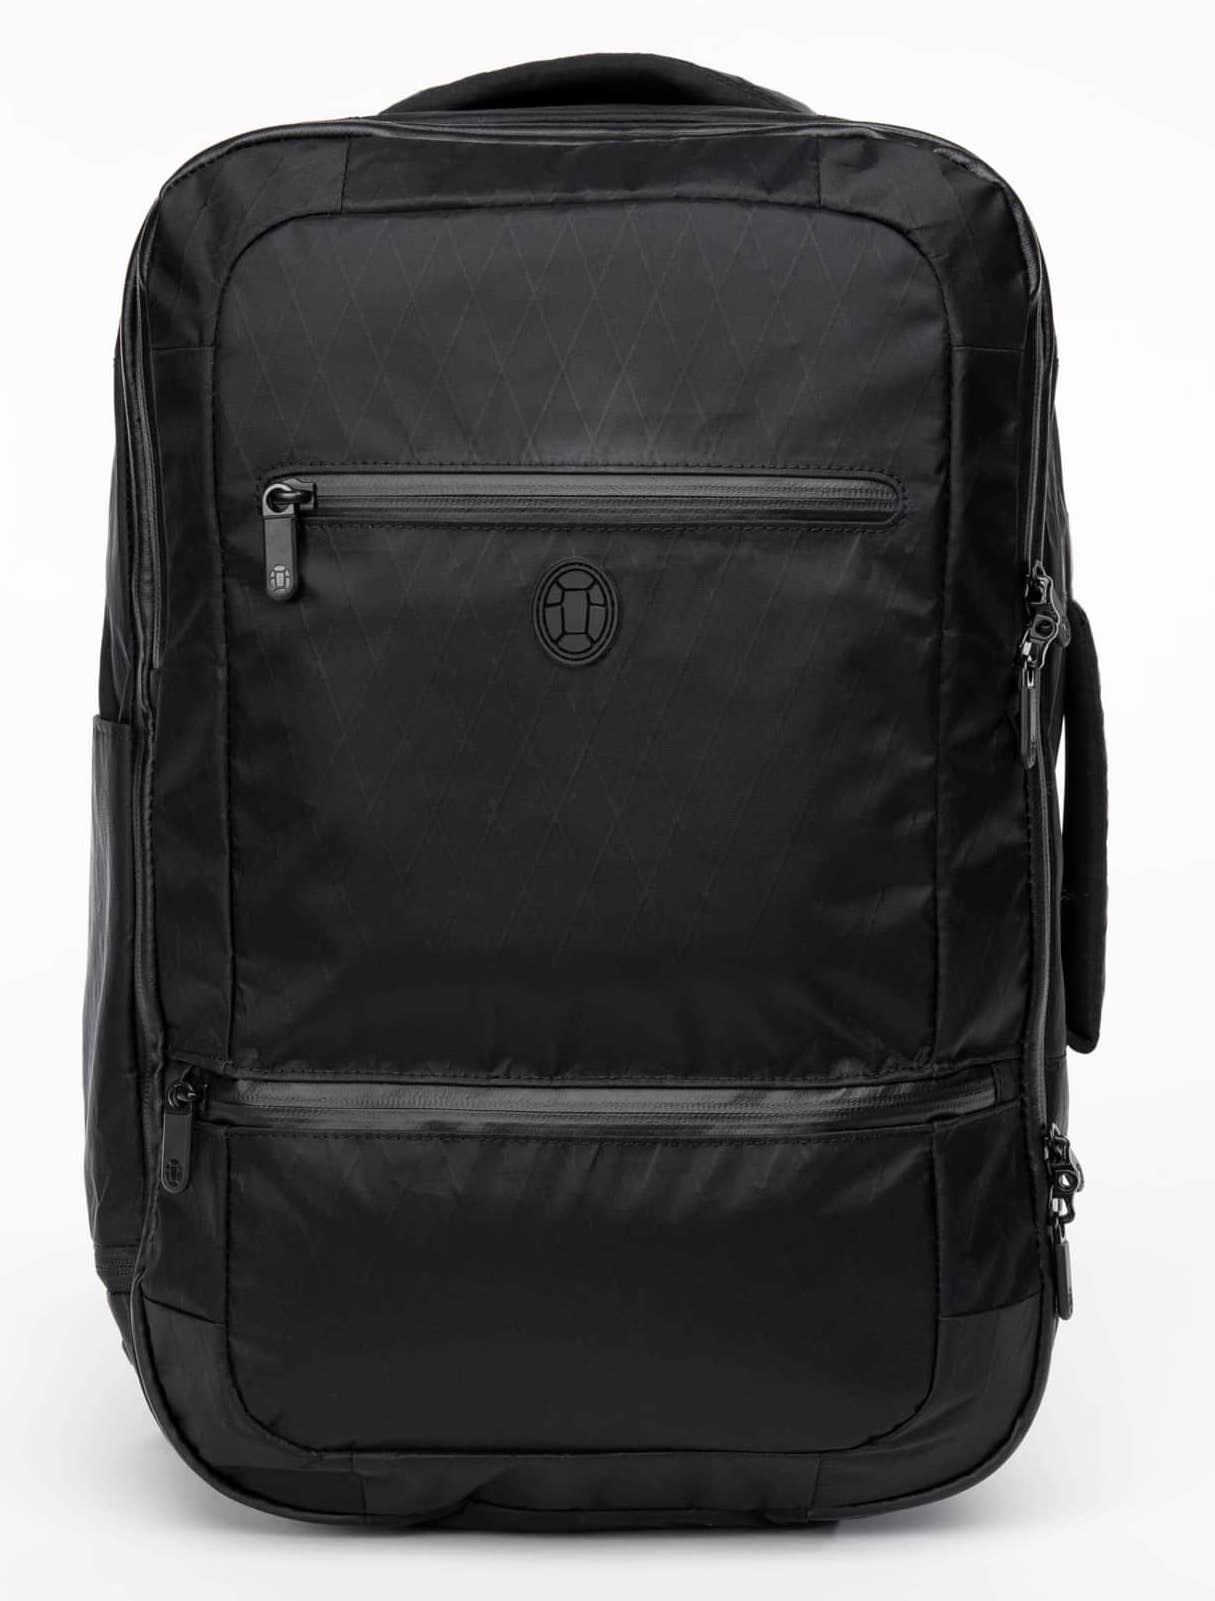 Tortuga Outbreaker Travel Backpack - Best Travel Backpack